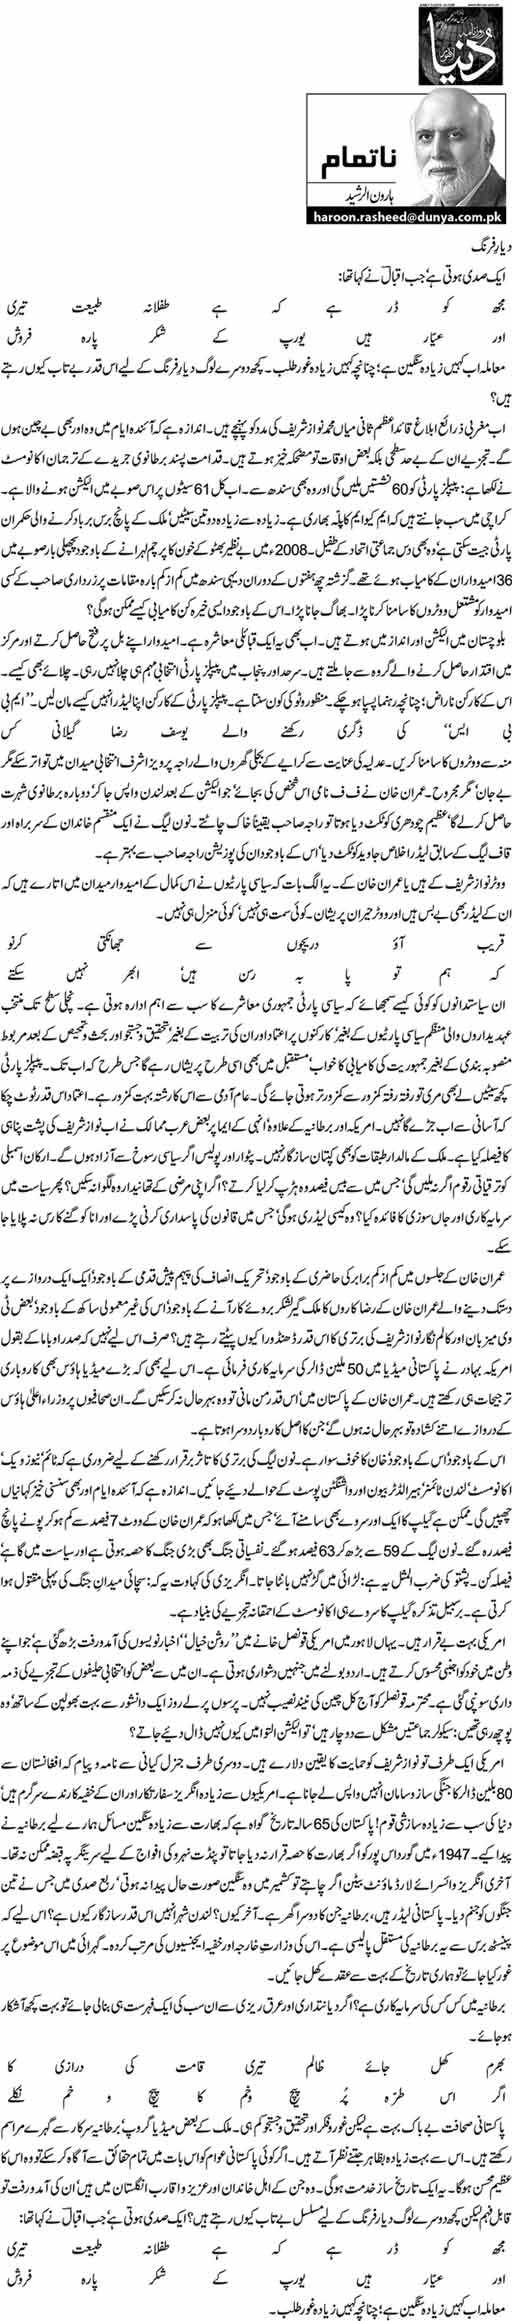 Diyyar e Farang - Haroon-ur-Rasheed